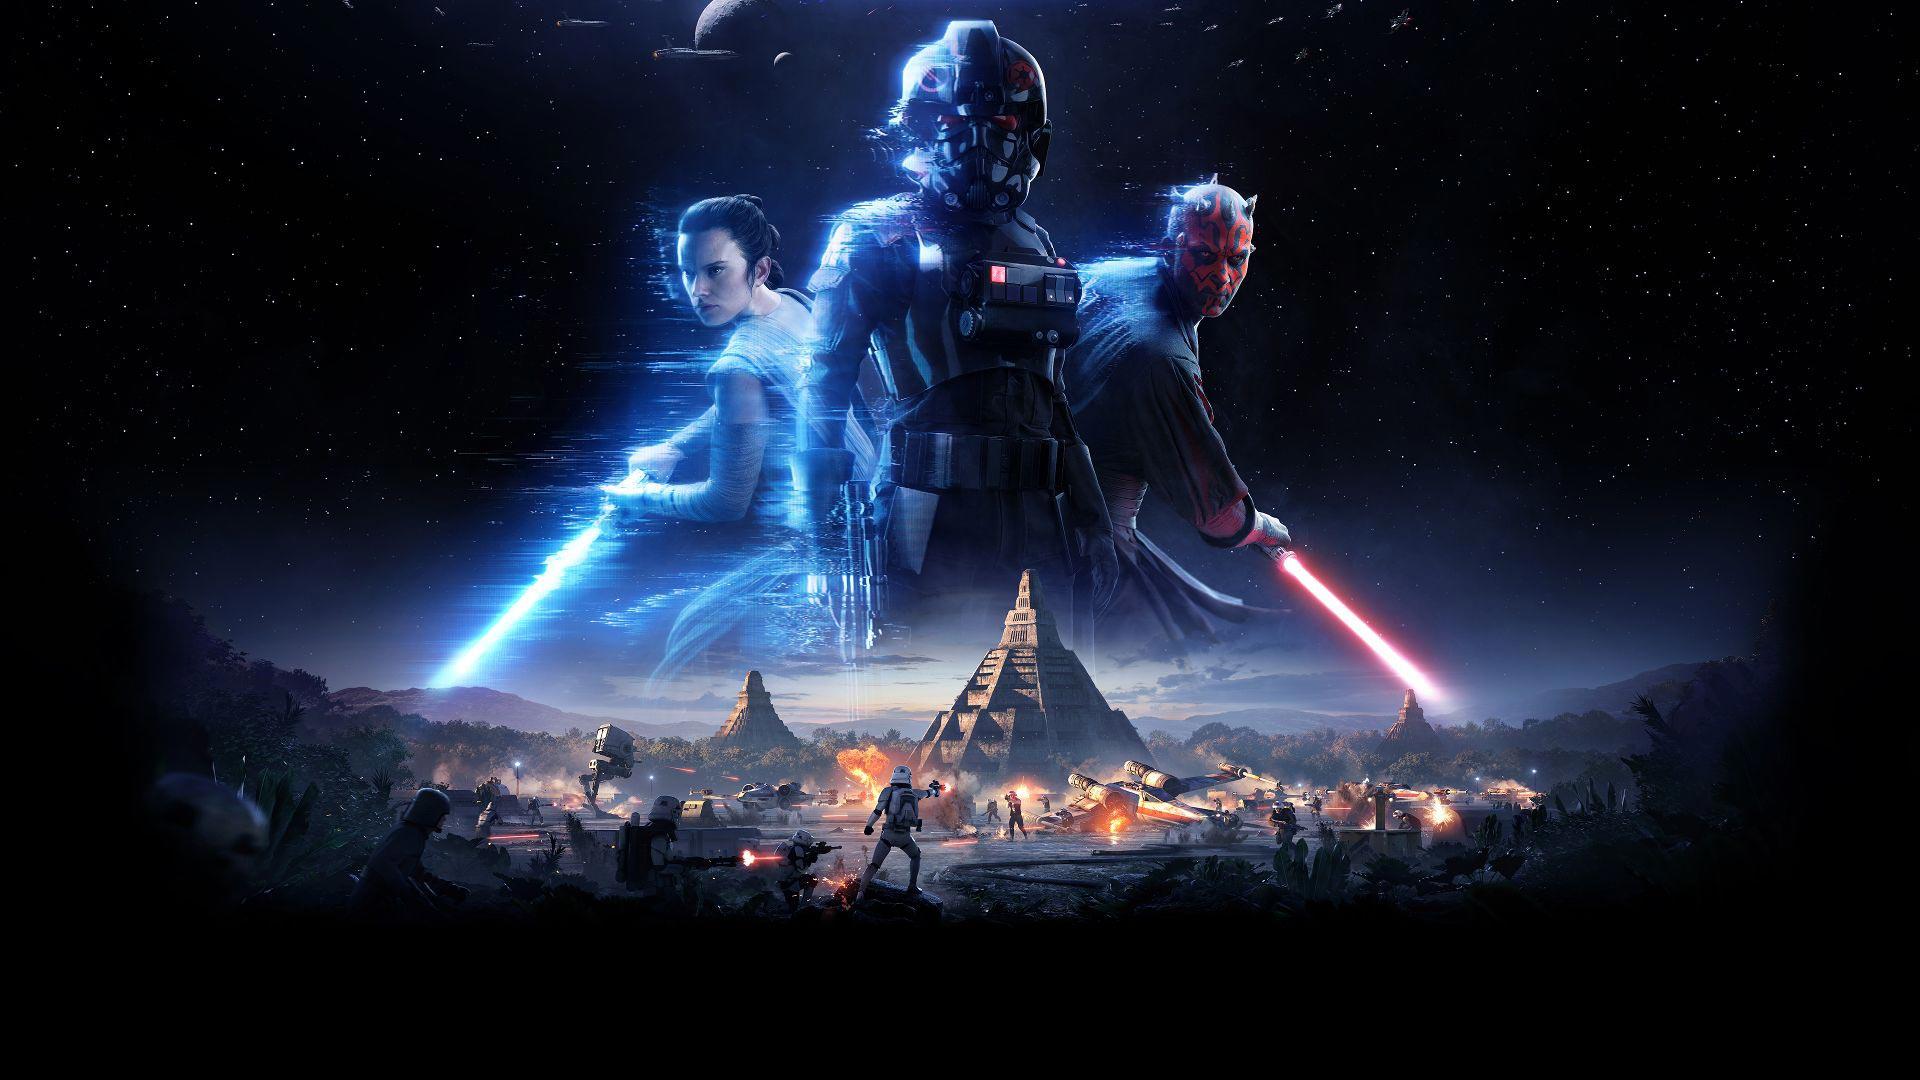 Star Wars Battlefront Ii Theme For Windows 10 8 7